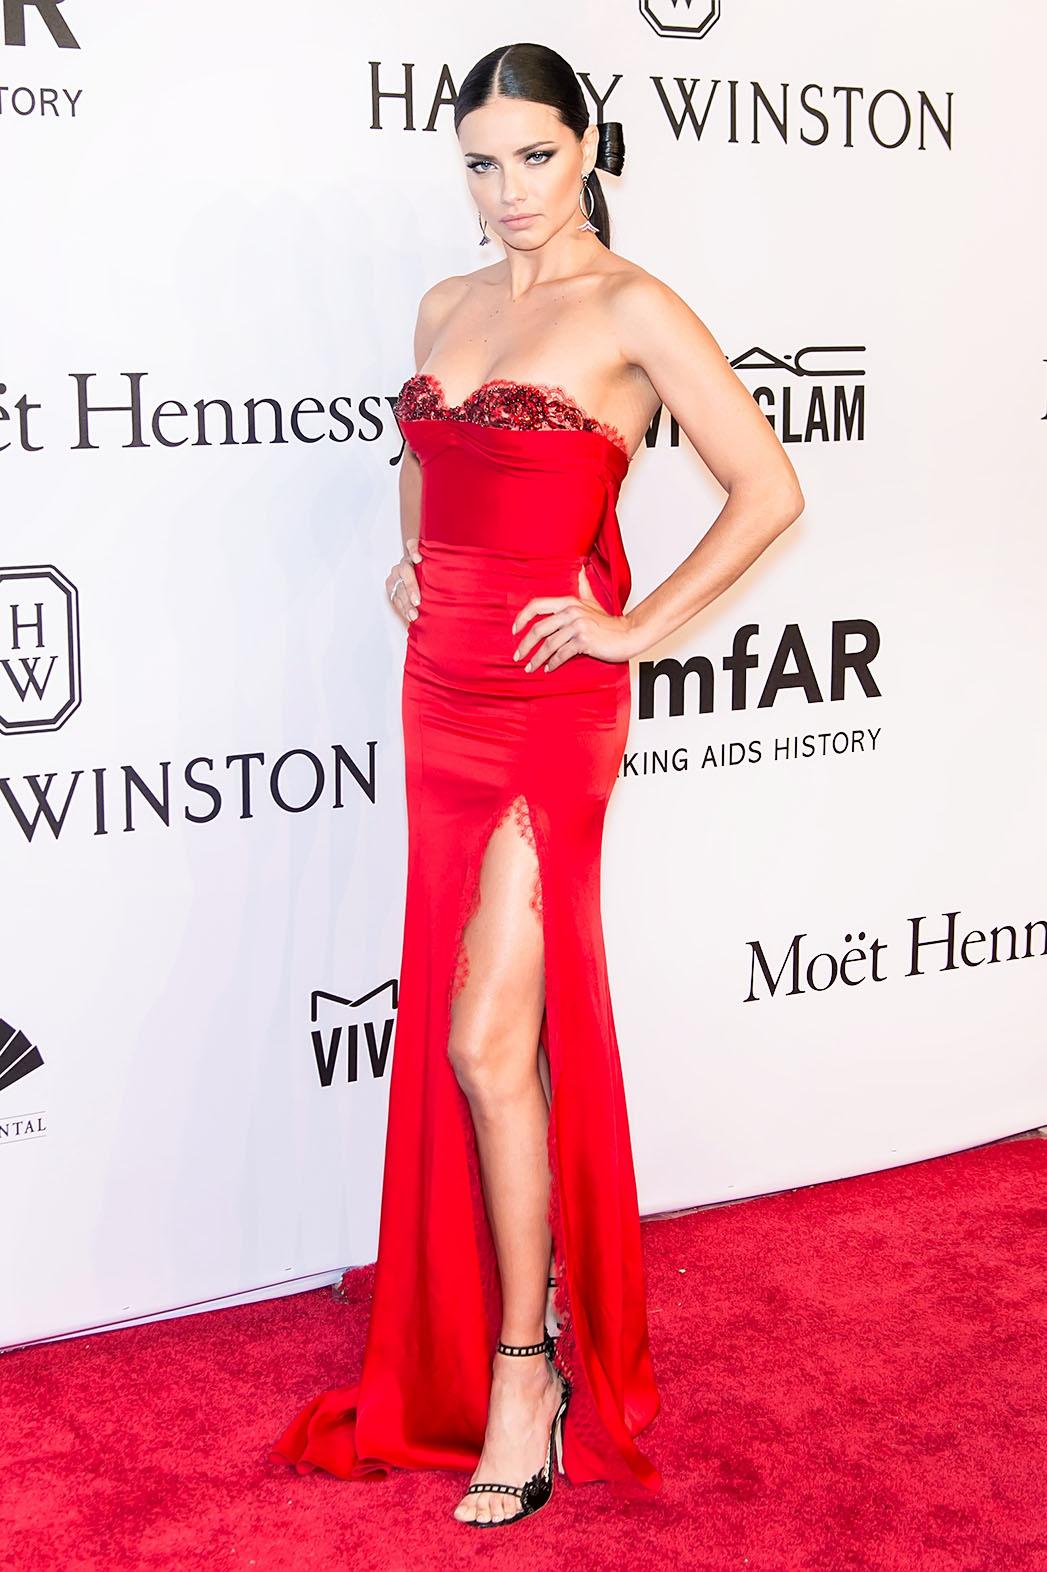 Adriana Lima attends the 2016 amfAR New York Gala - P 2016